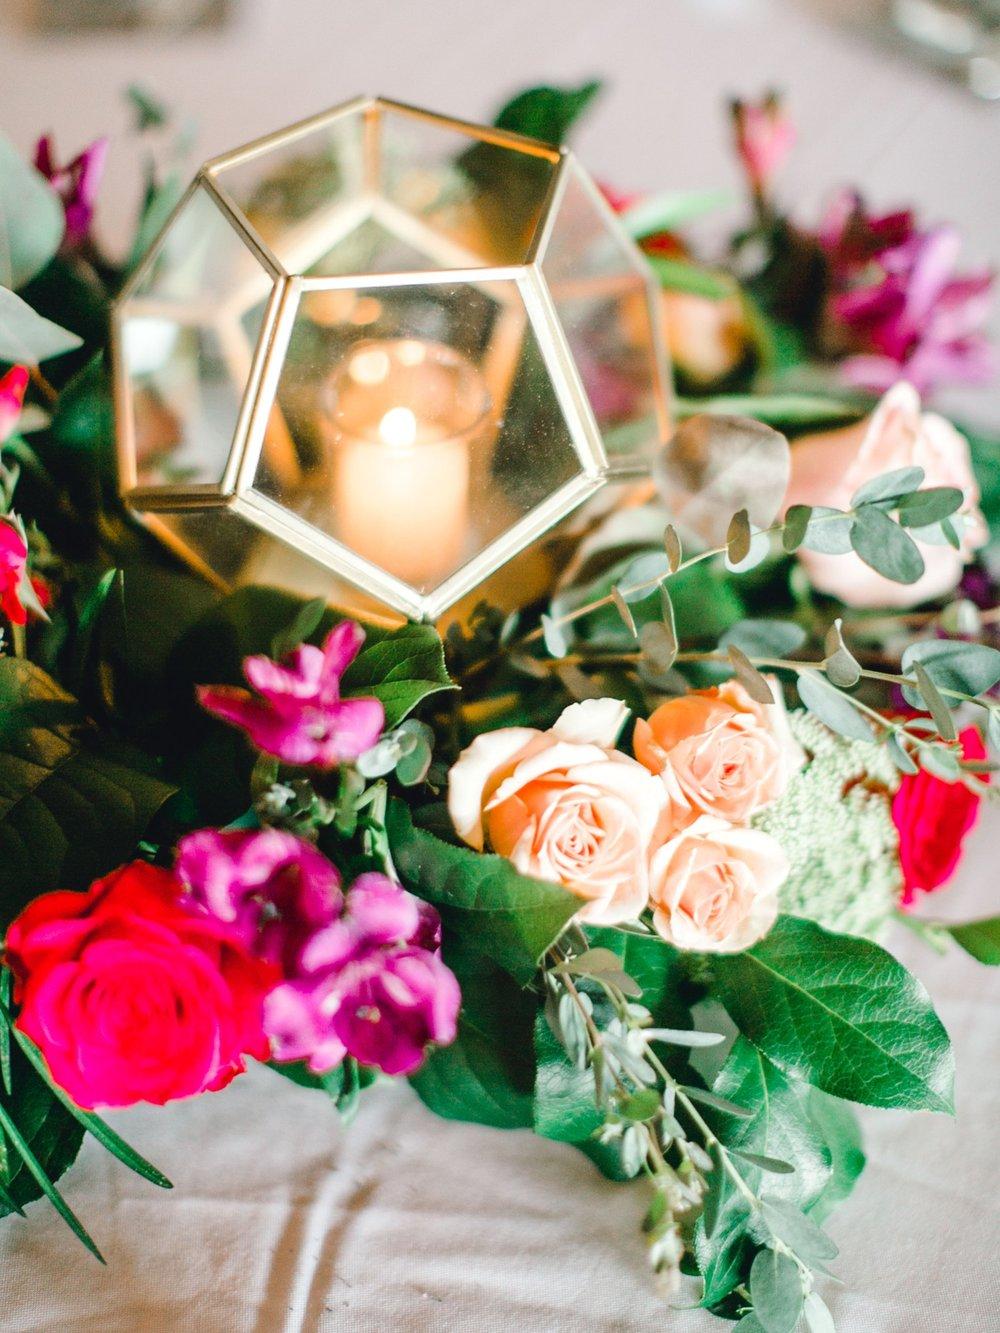 Jenna-and-garrett-Everett-kitalou-gin-lubbock-wedding-dayspring-designs-lubbock-wedding-photographer_0139.jpg